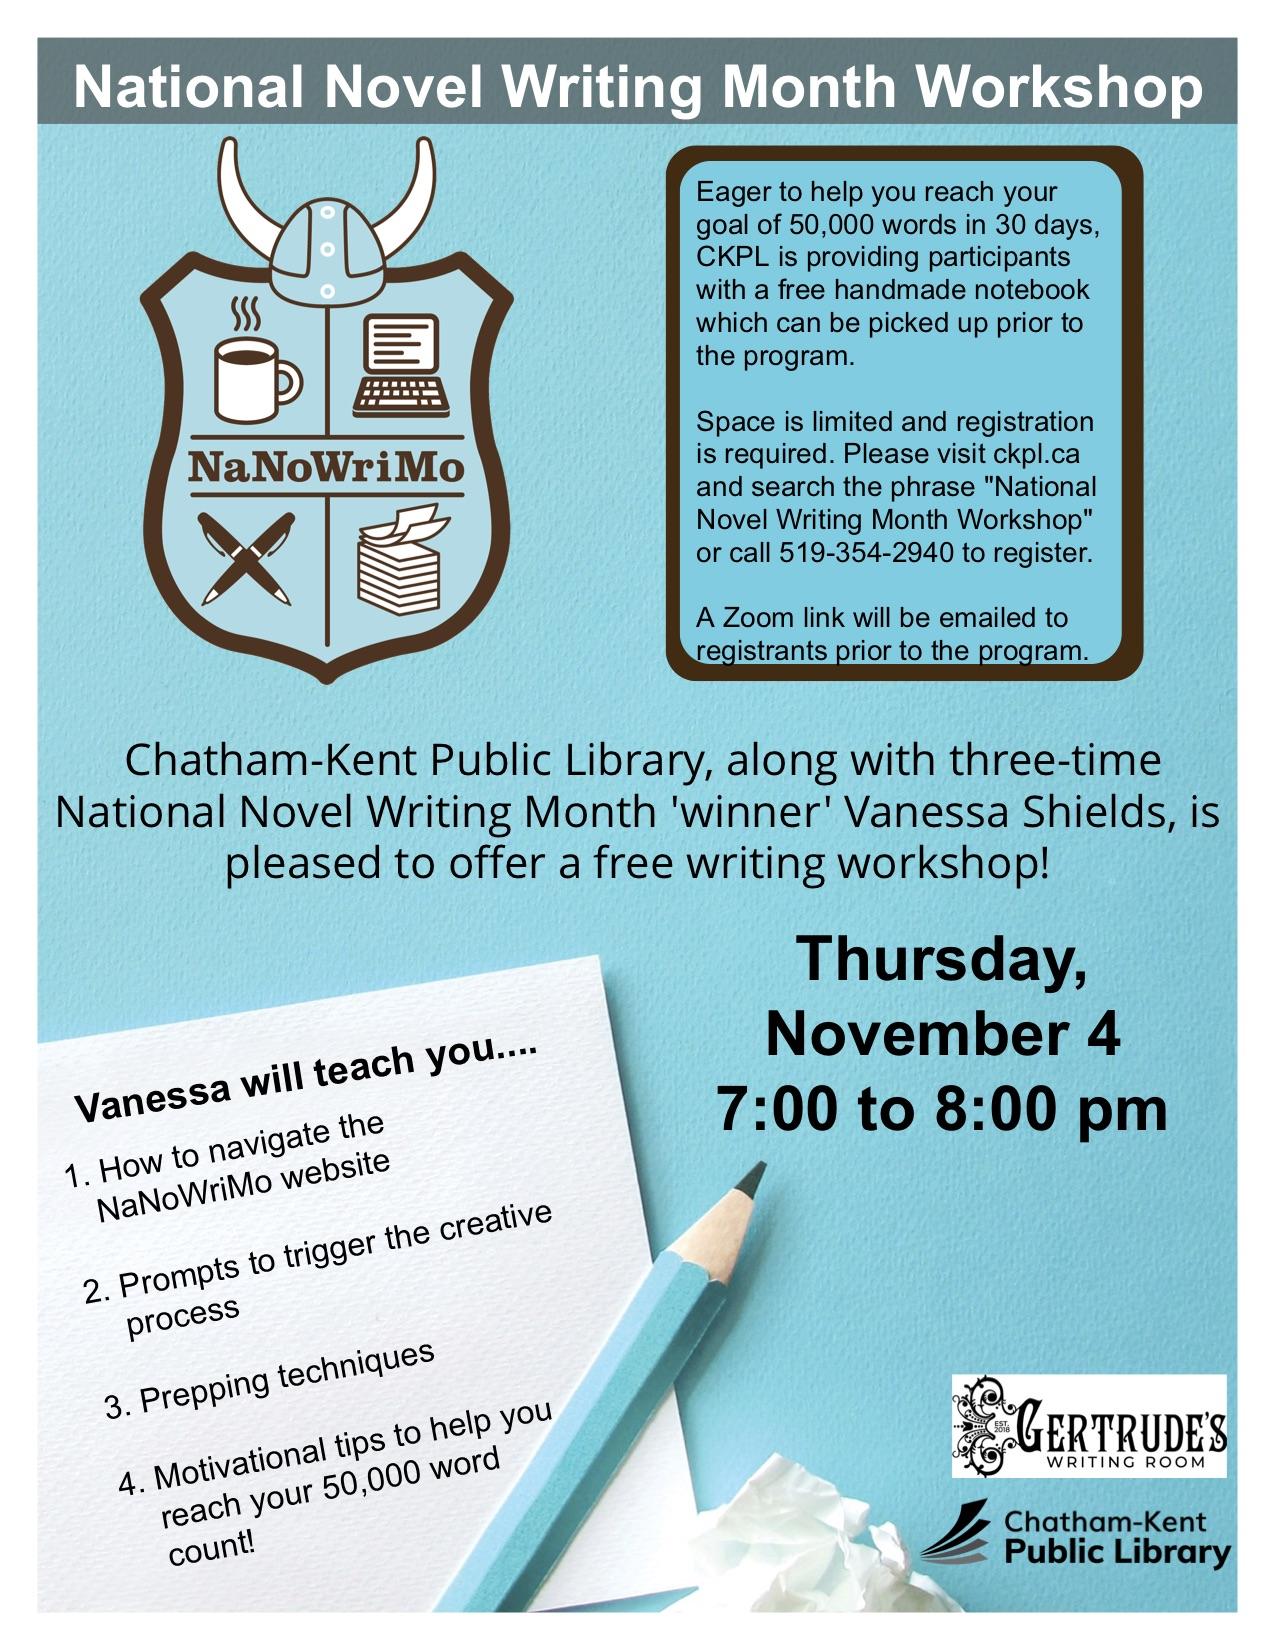 National Novel Writing Month Poster